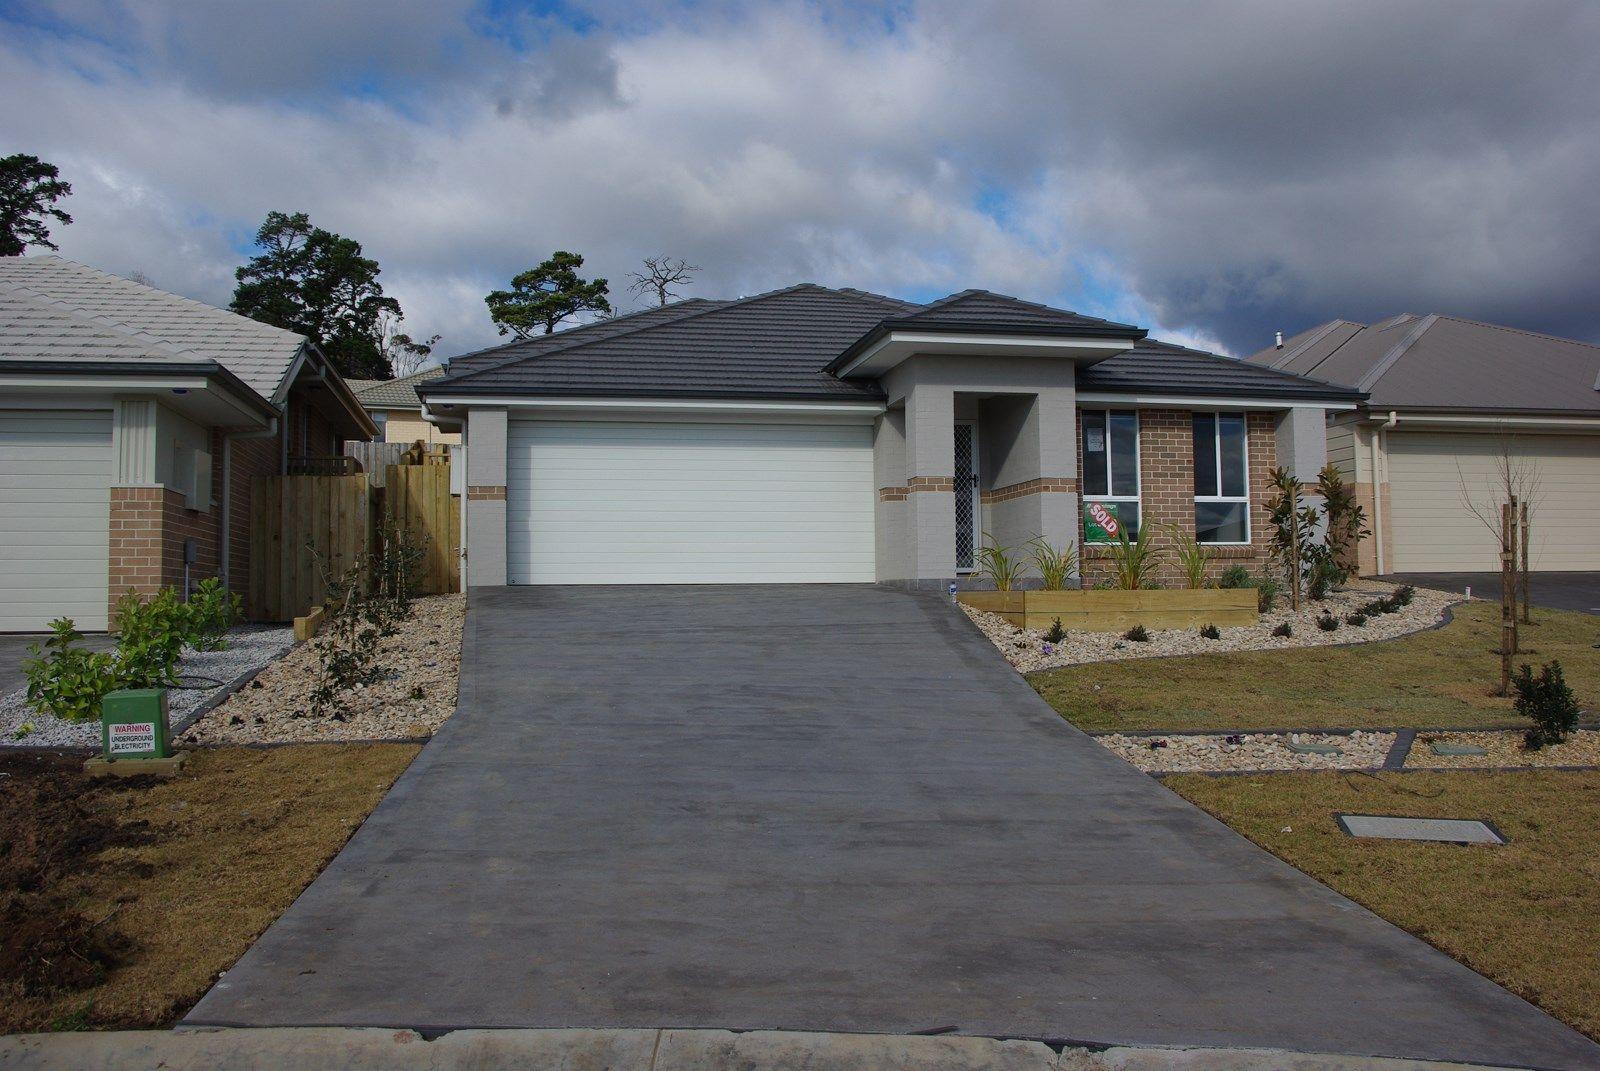 15 MCALROY PLACE, Goulburn NSW 2580, Image 0